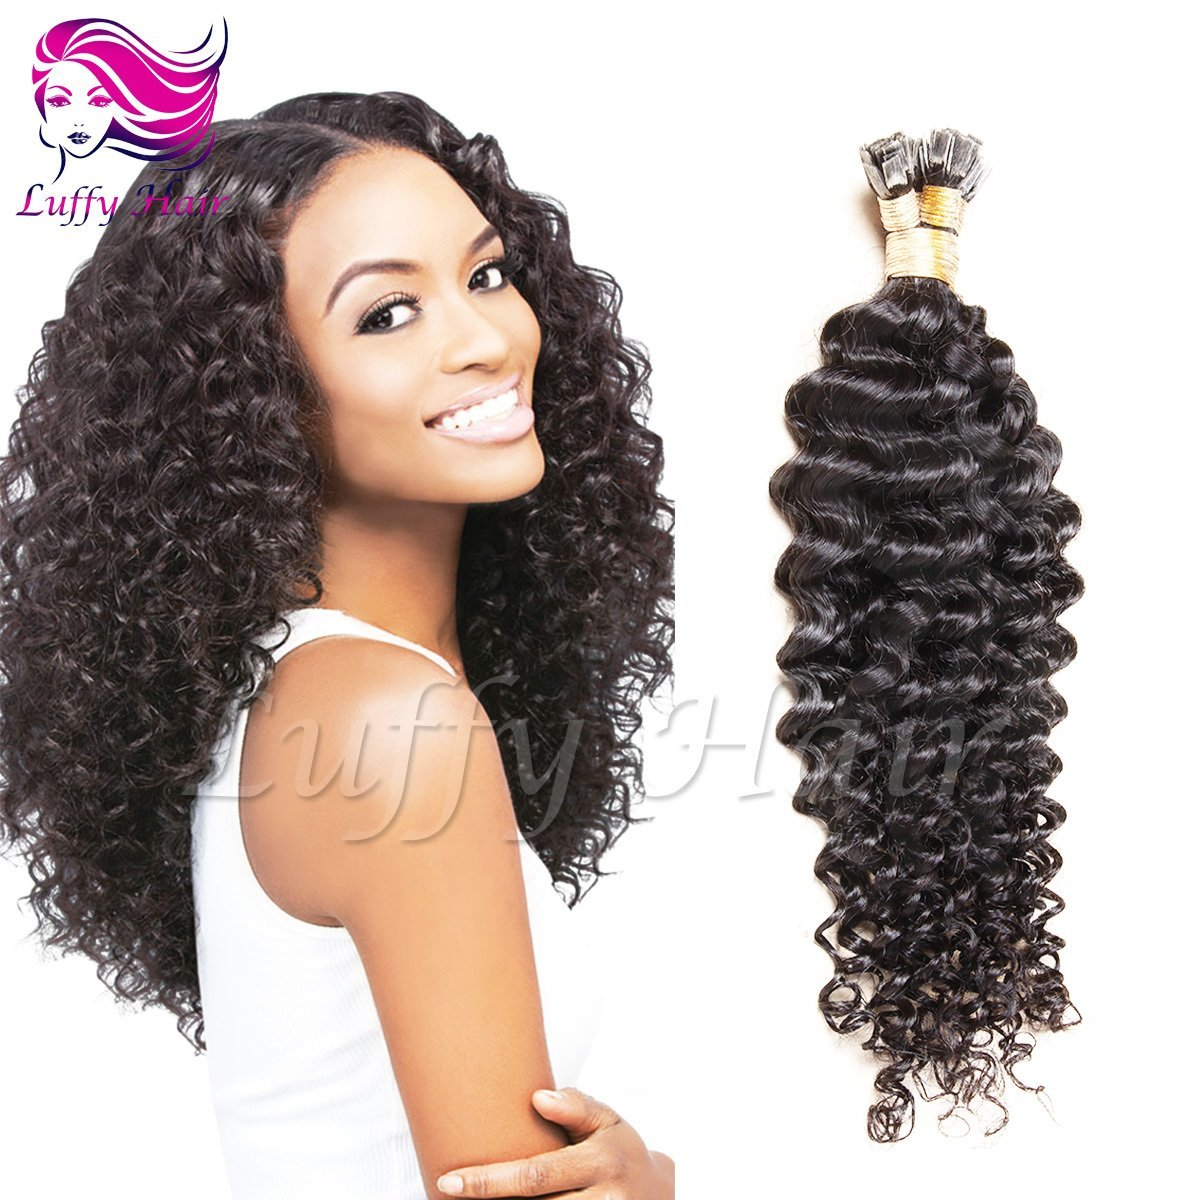 8A Virgin Human Hair Curly Fusion Hair Extensions - KFL005